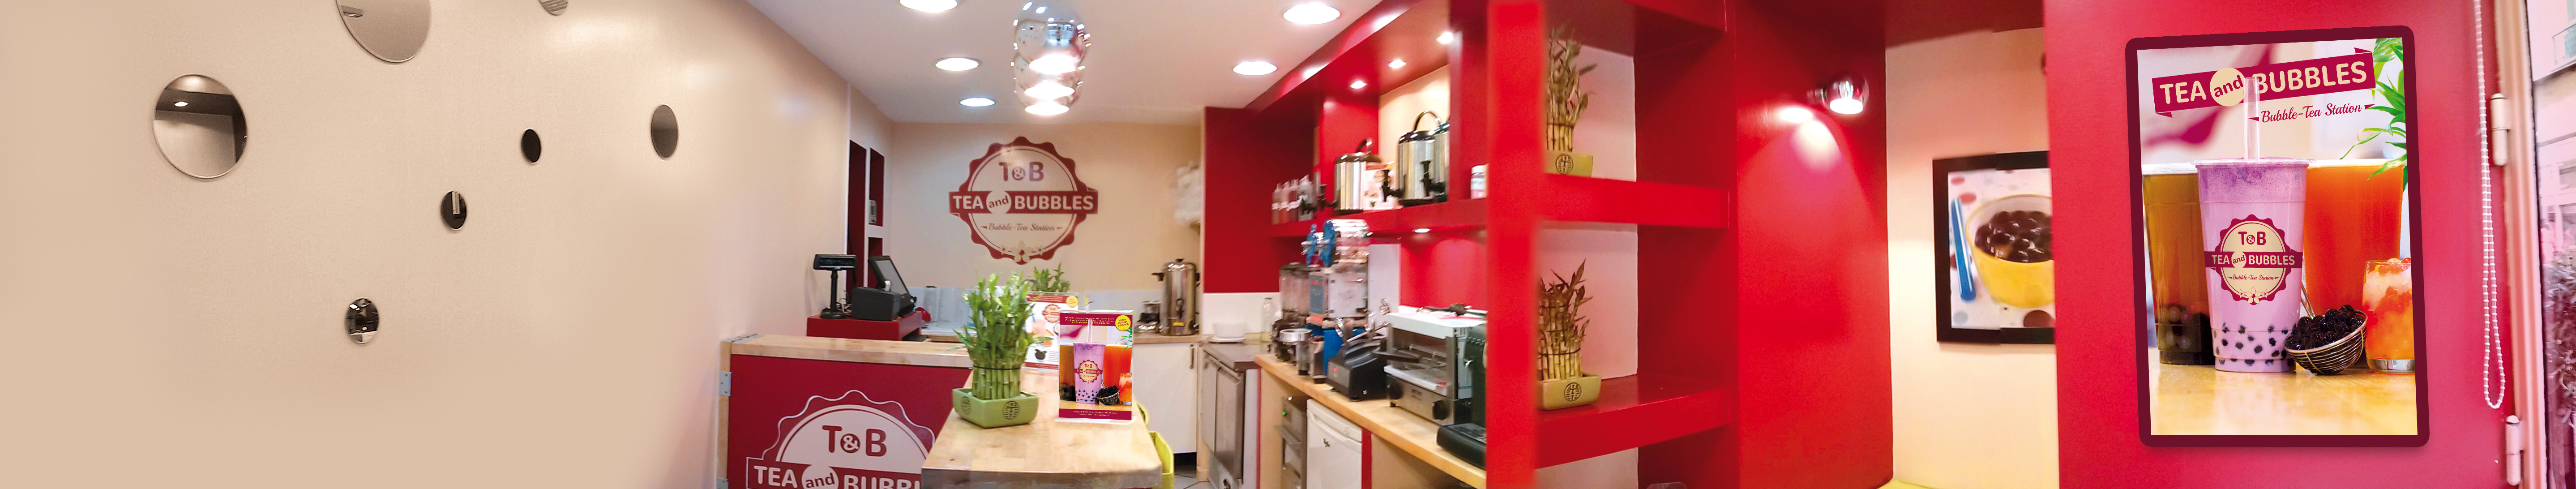 Tea and Bubbles - bubble-tea station